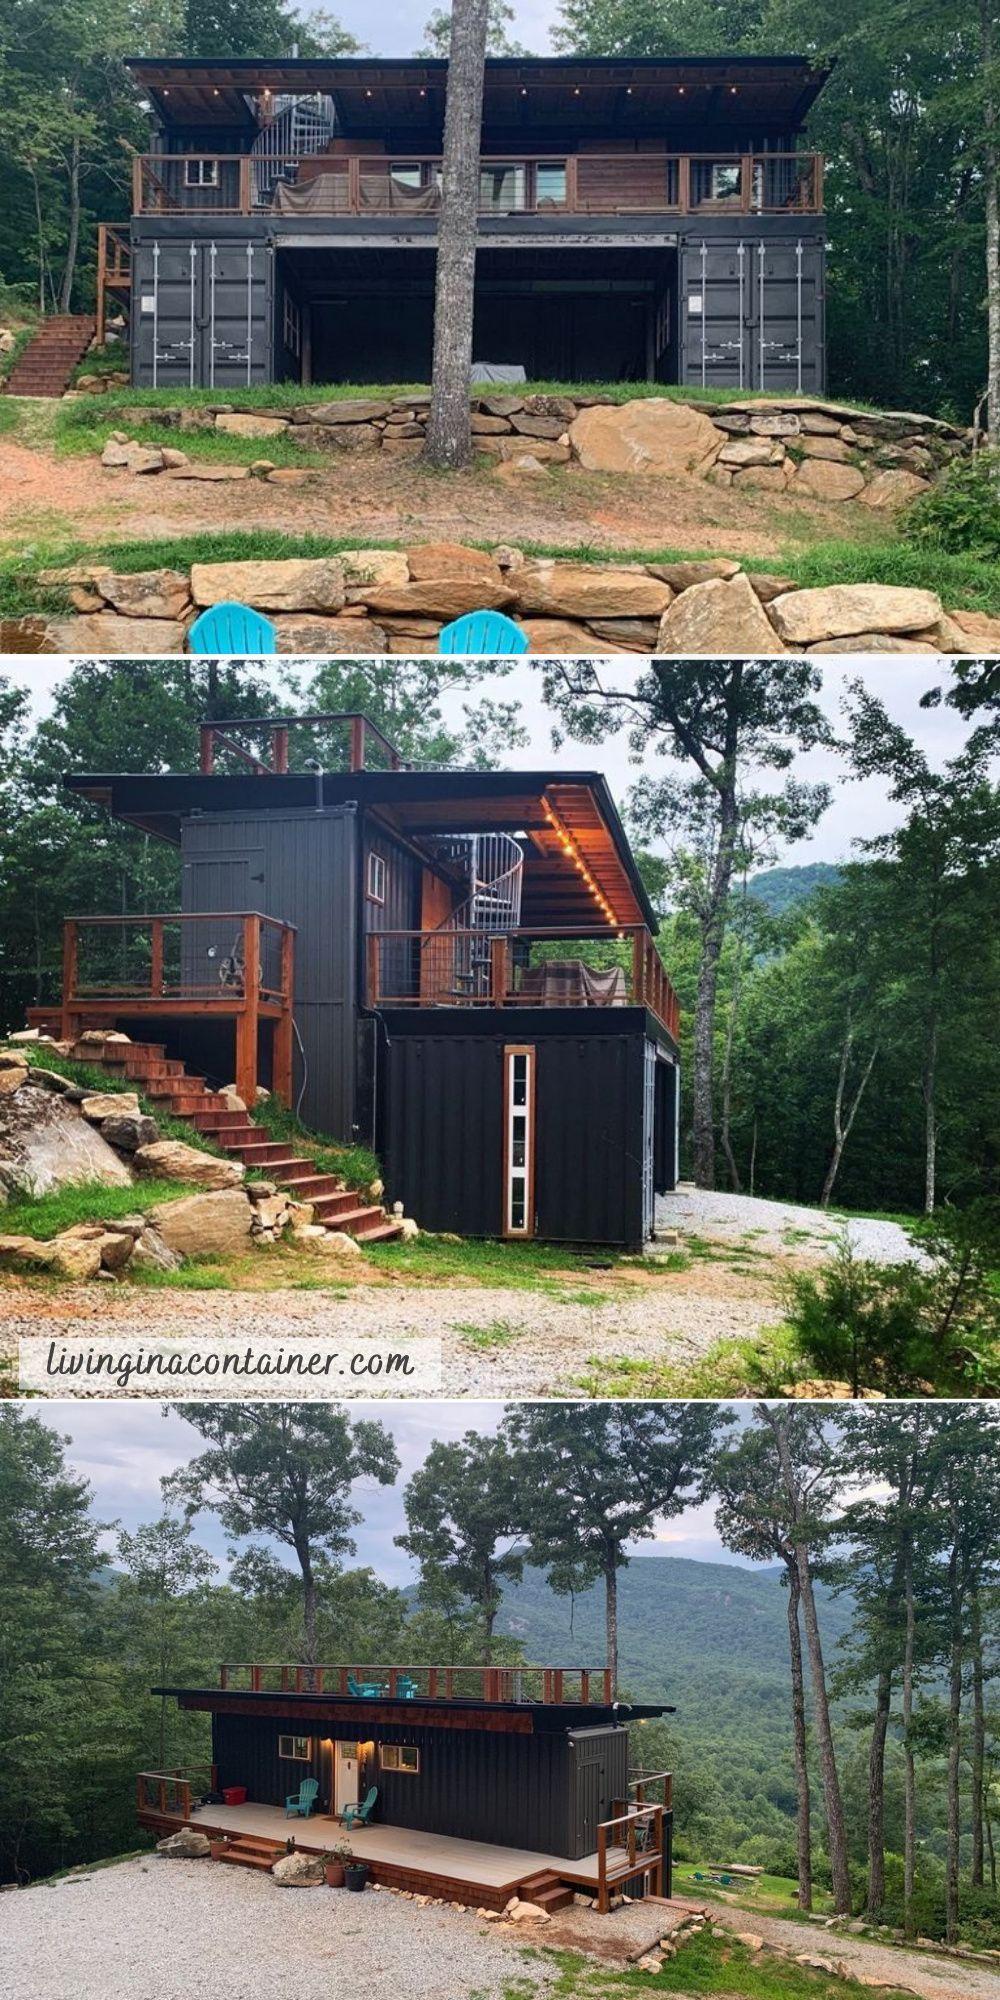 430 Outdoor Spaces Ideas In 2021 Outdoor Spaces Outdoor Backyard